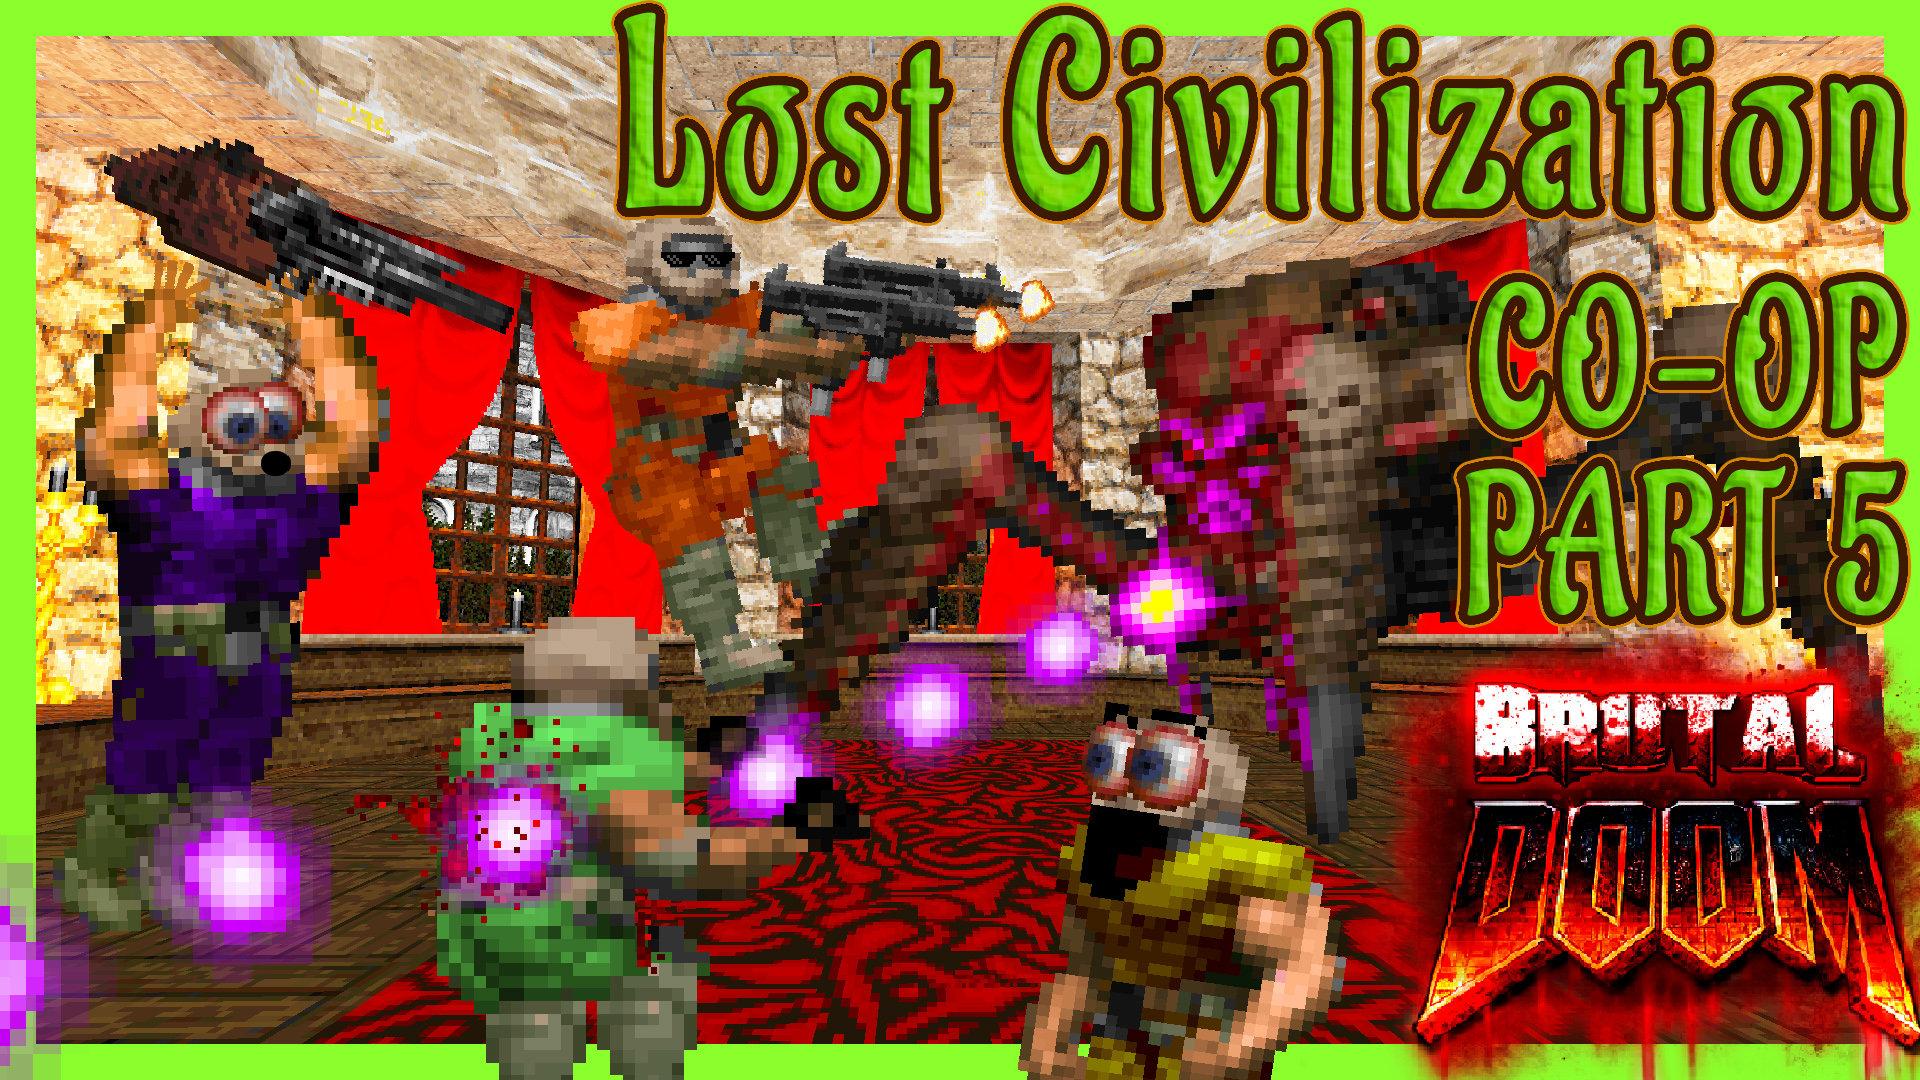 Lost Civilization (BD) part5.jpg